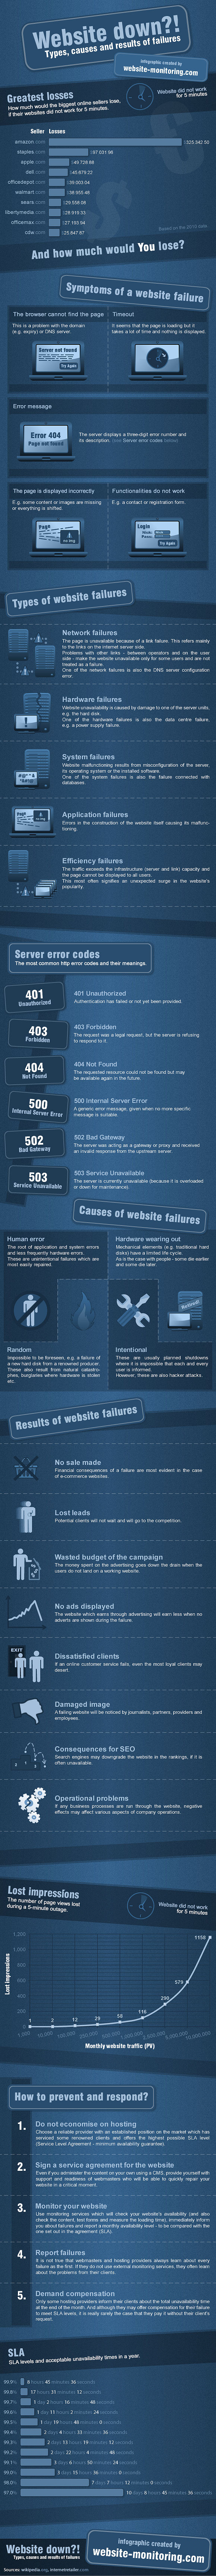 website_down